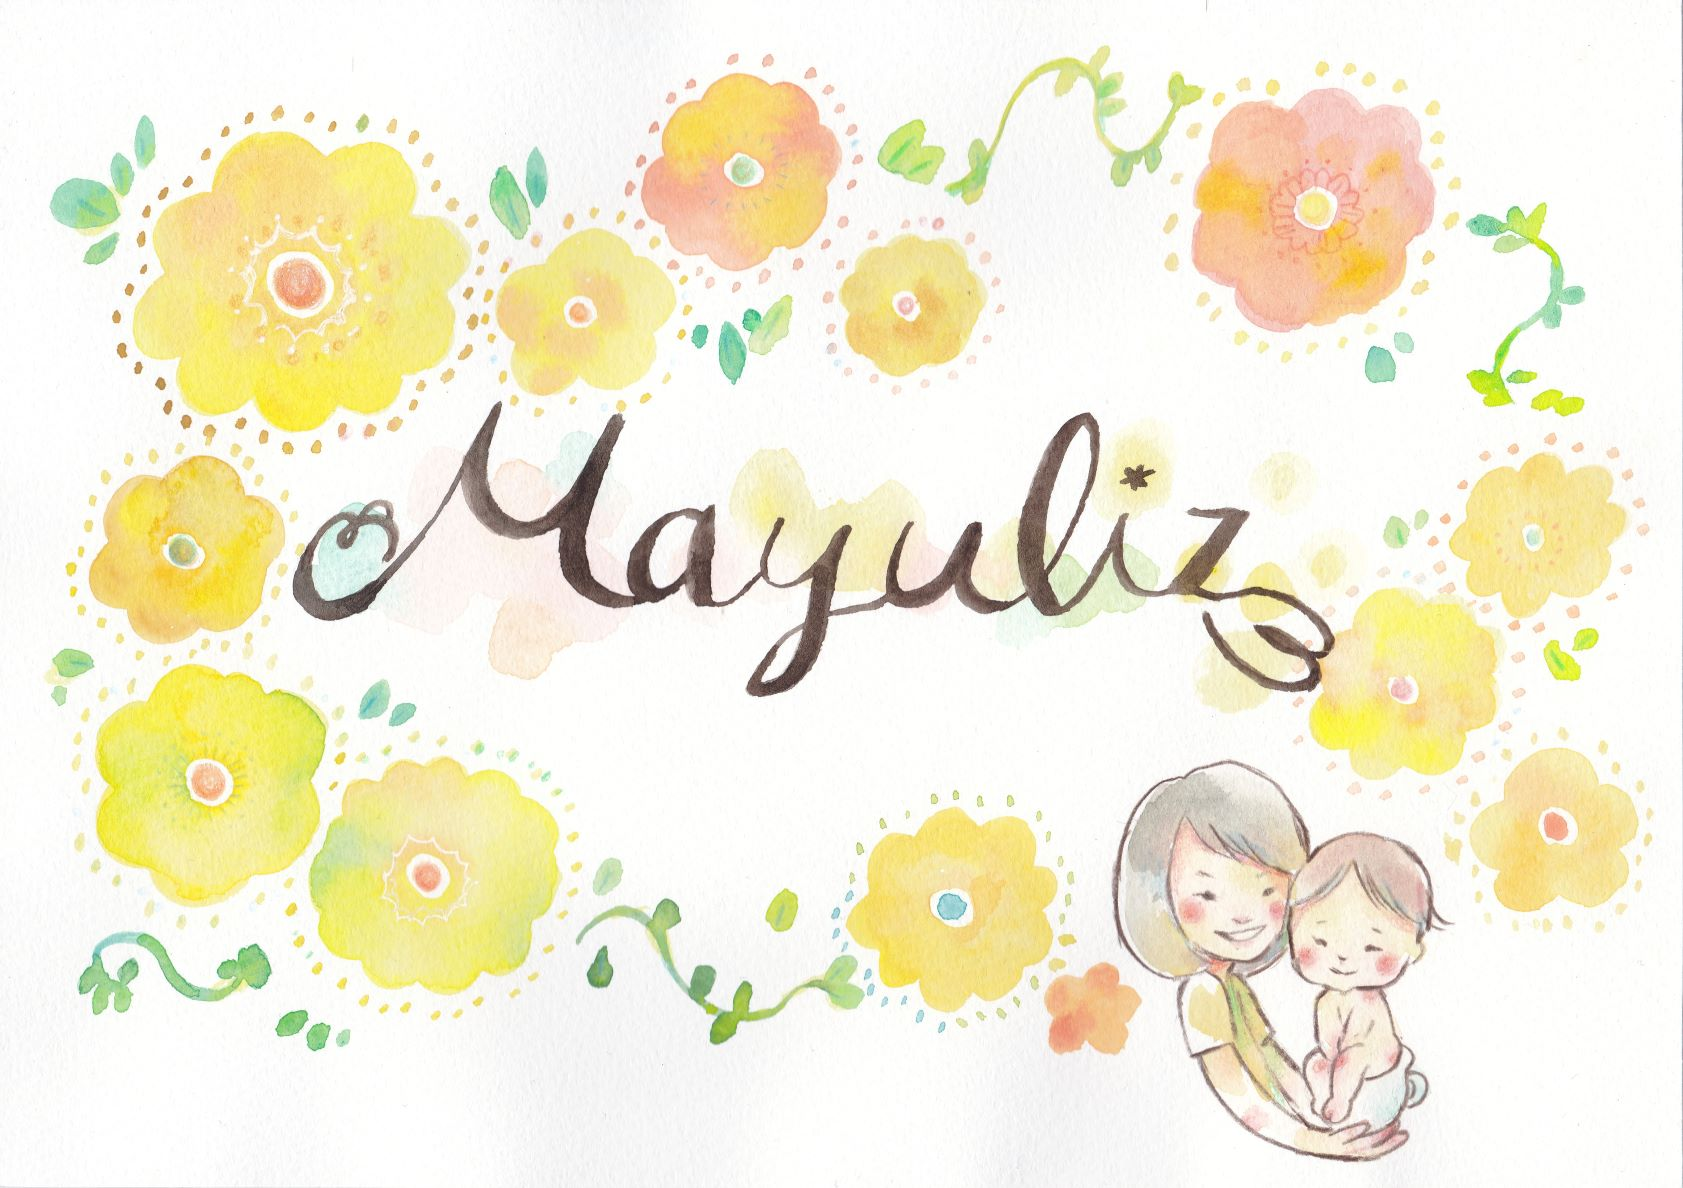 mayuliz0928